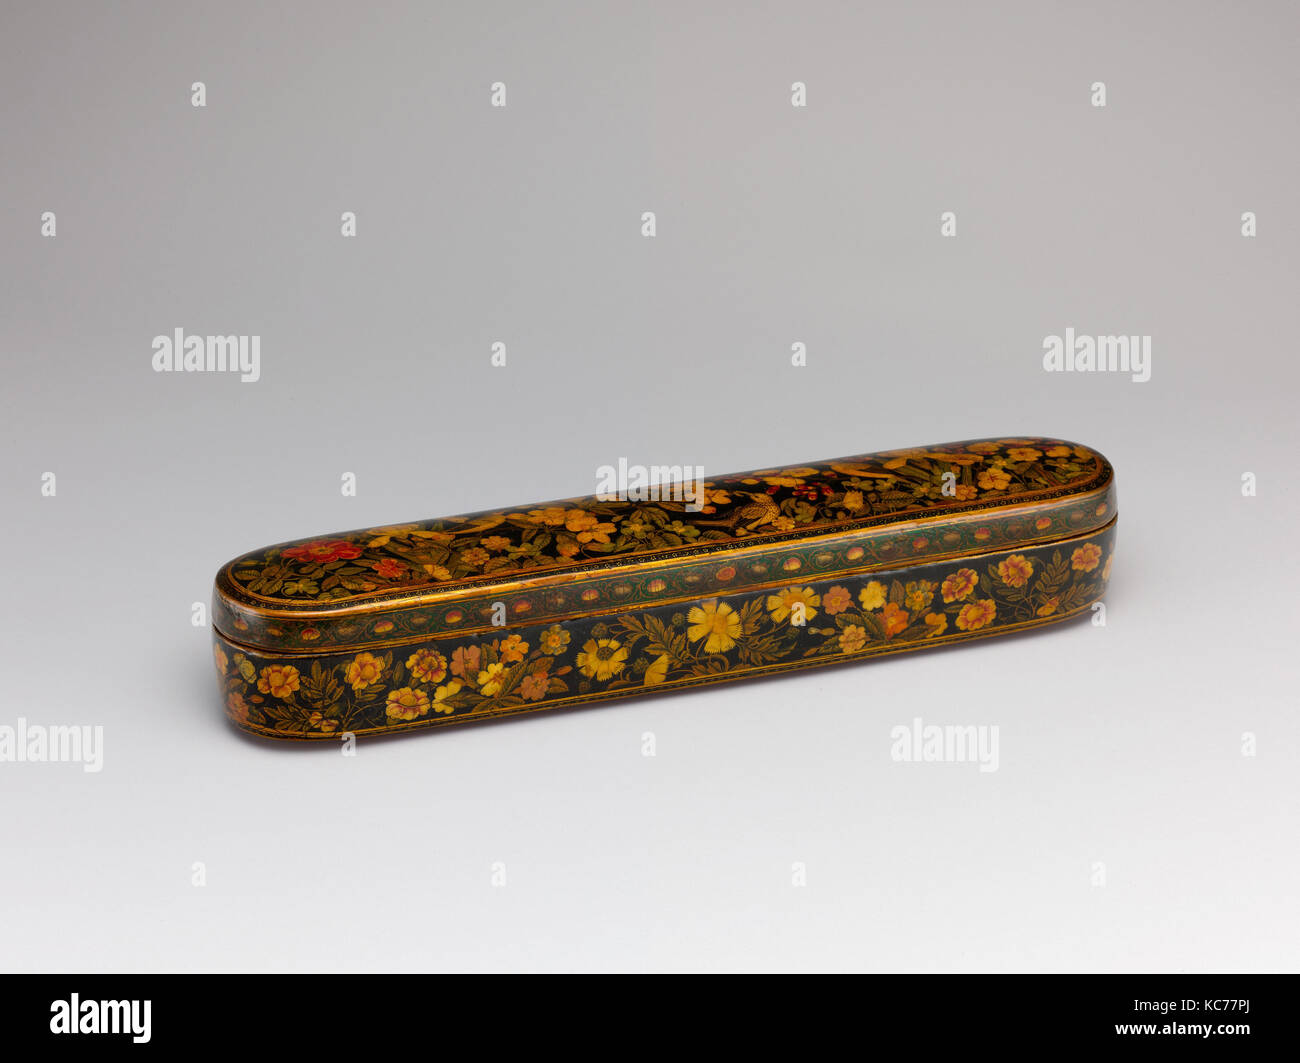 Pen Box with a Europeanizing Landscape, Hajji Muhammad, late 17th–early 18th century Stock Photo